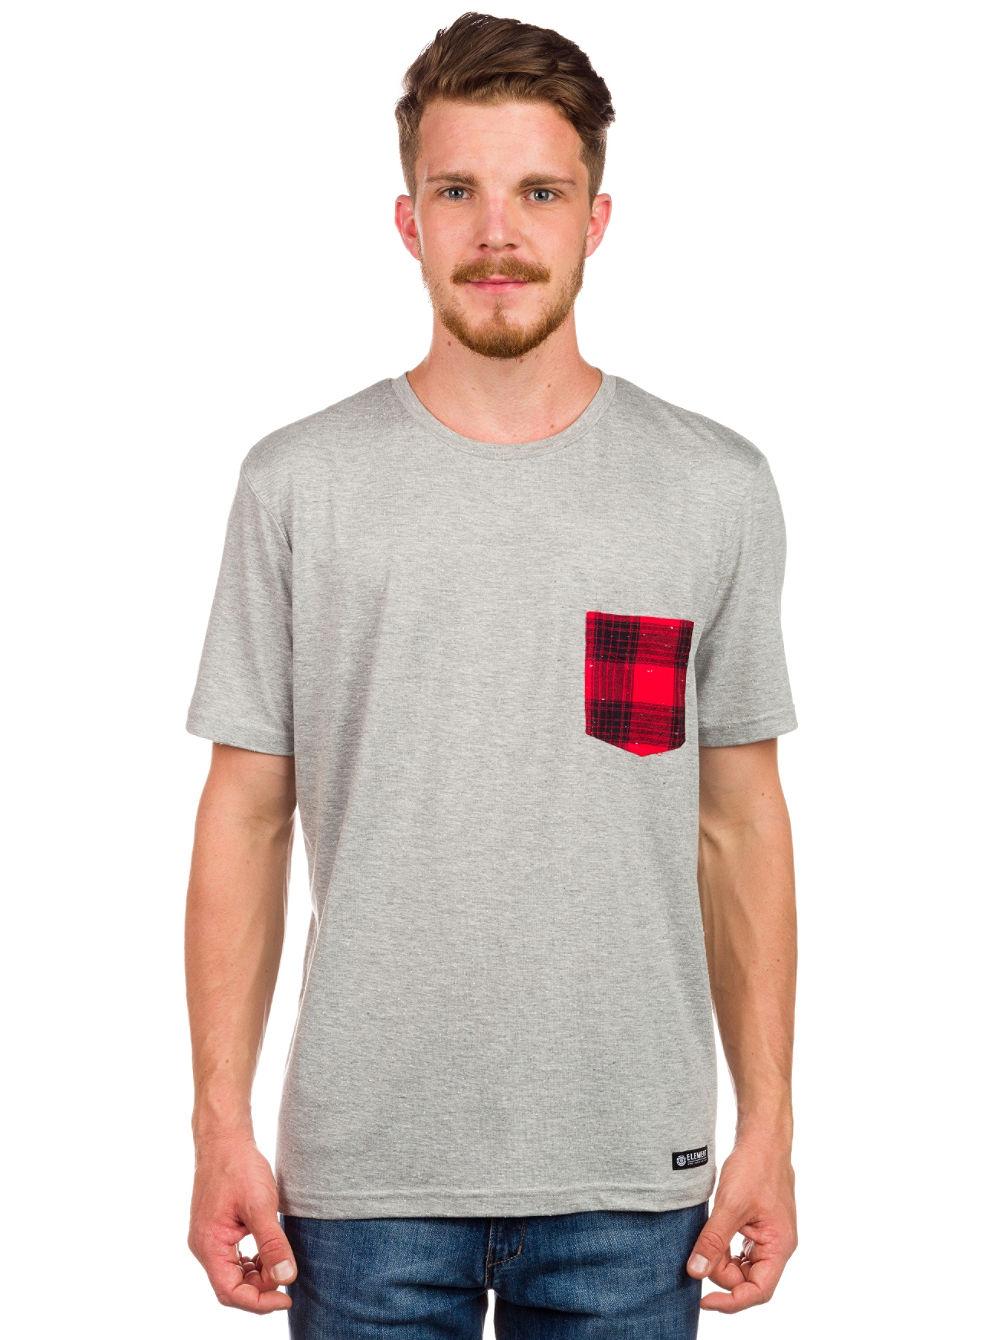 boyer-t-shirt